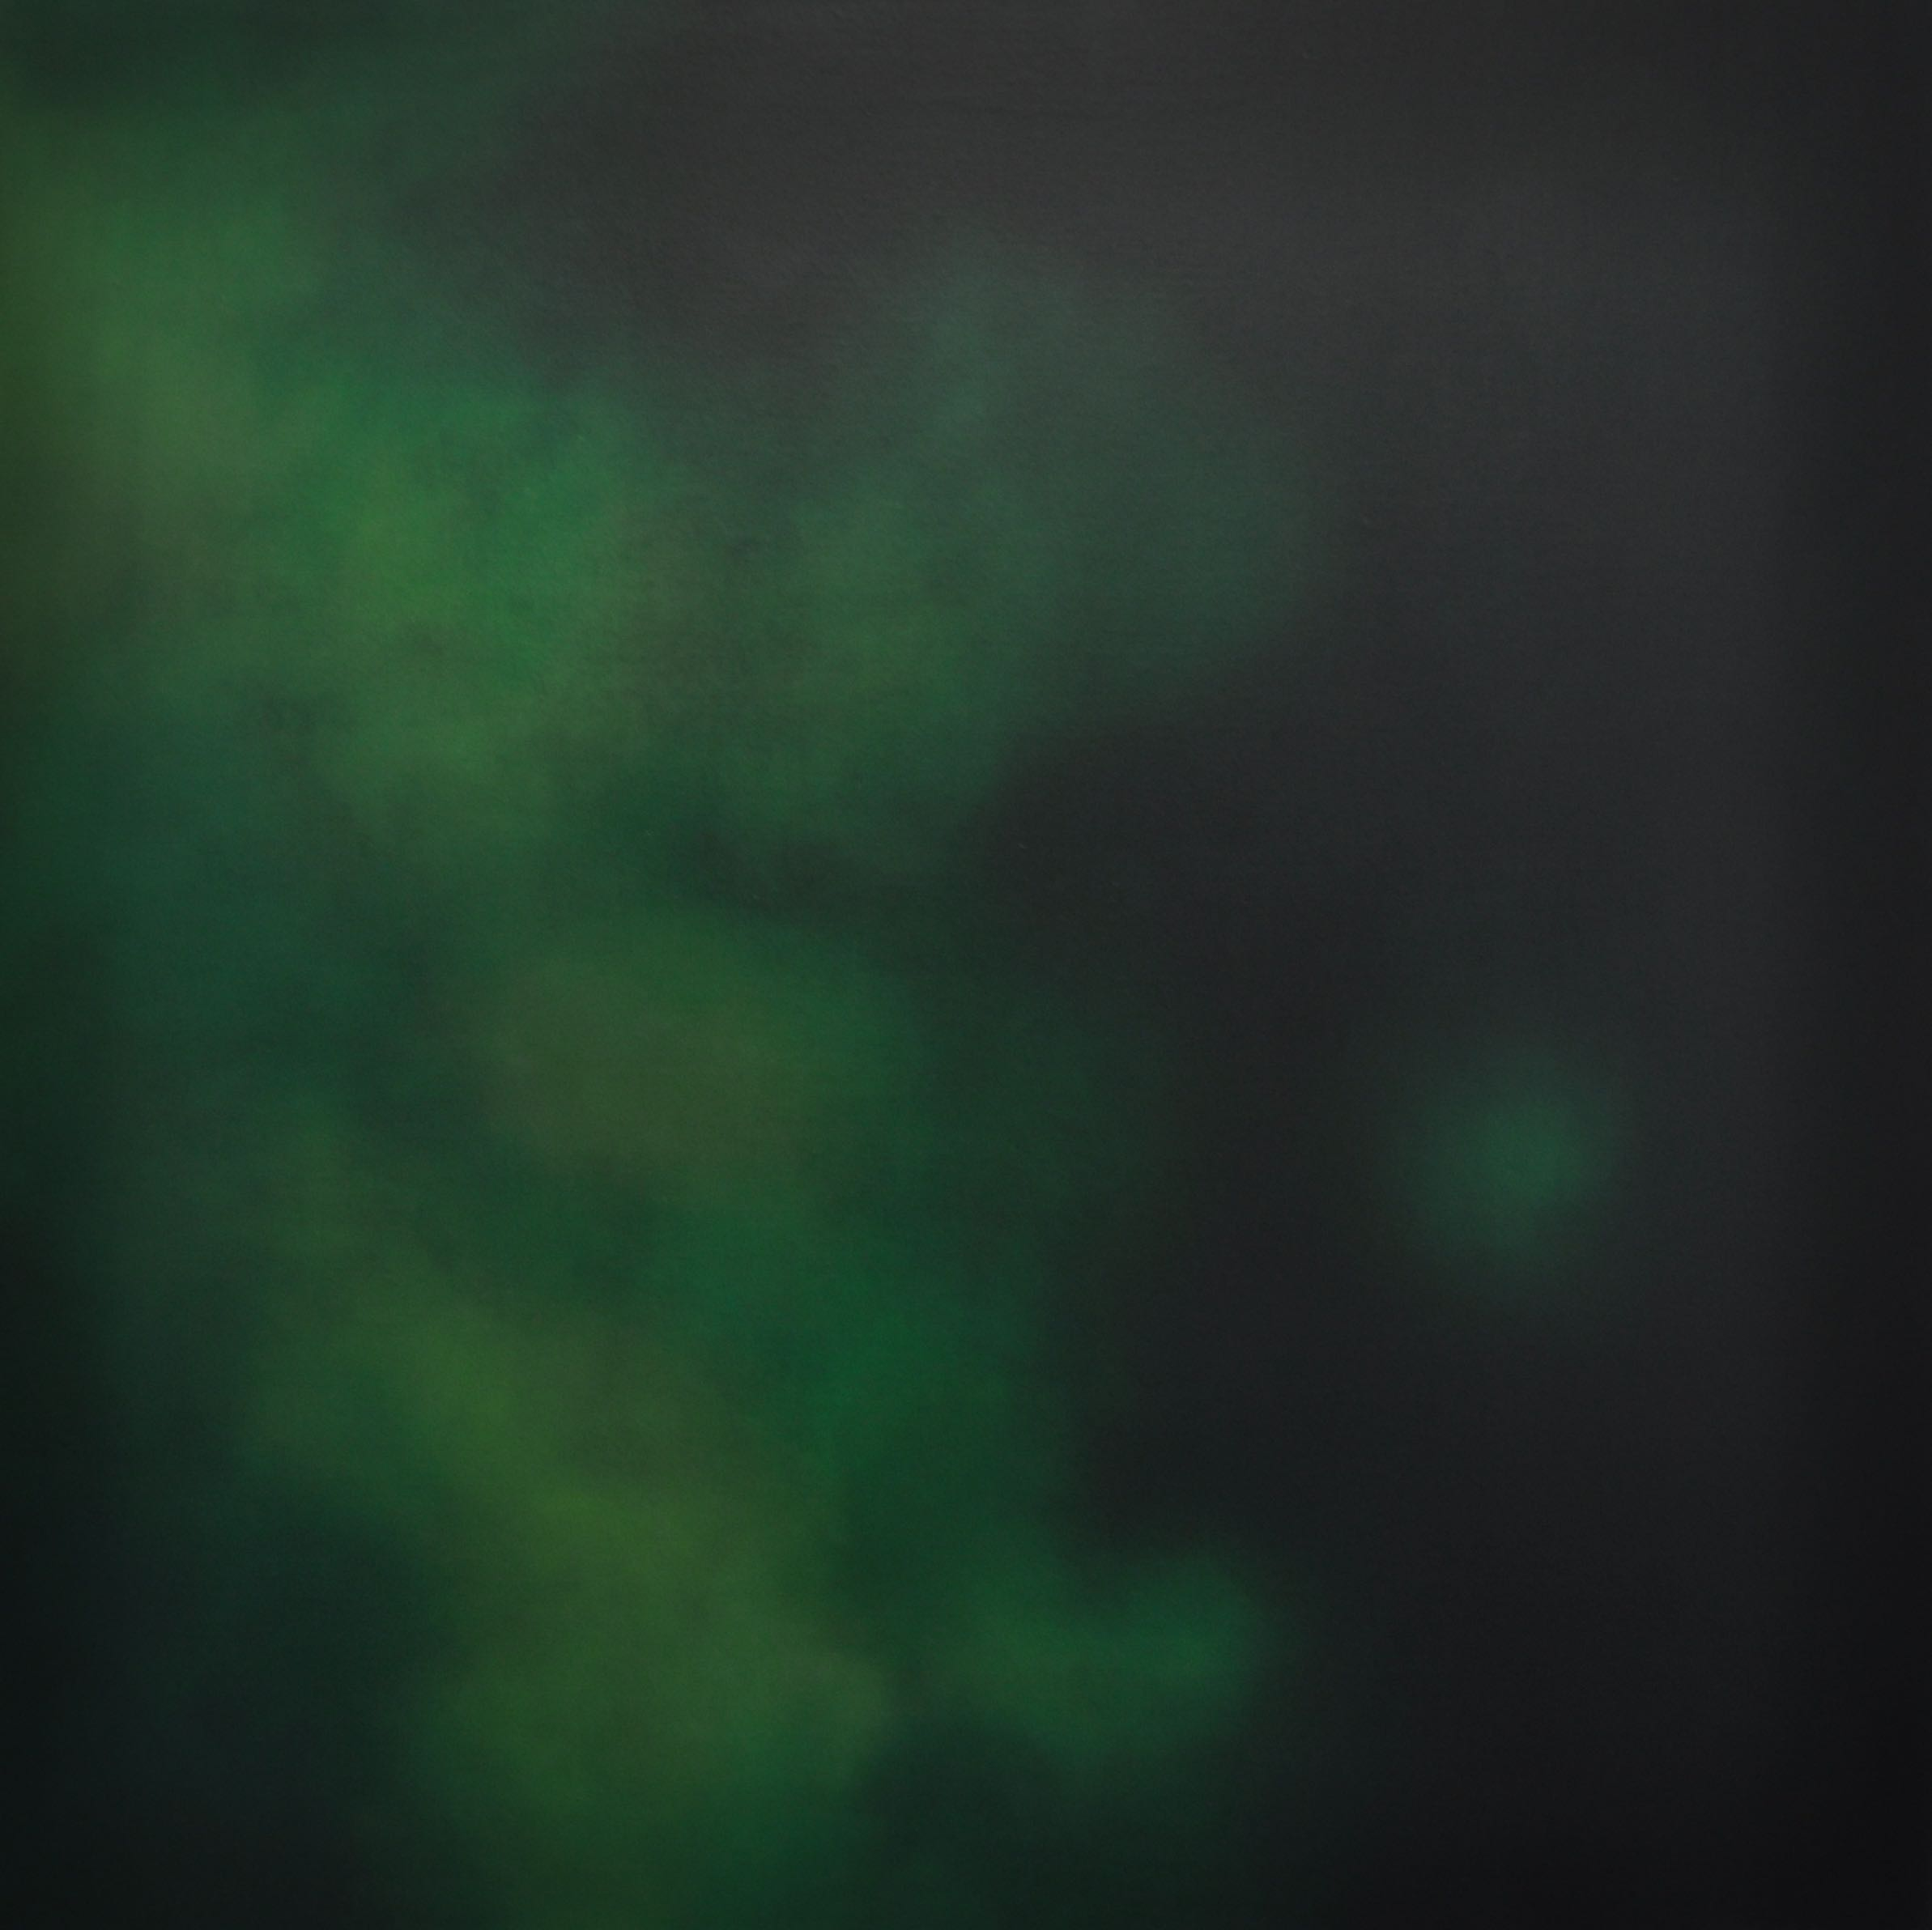 Green into Black 120x120cm 2008